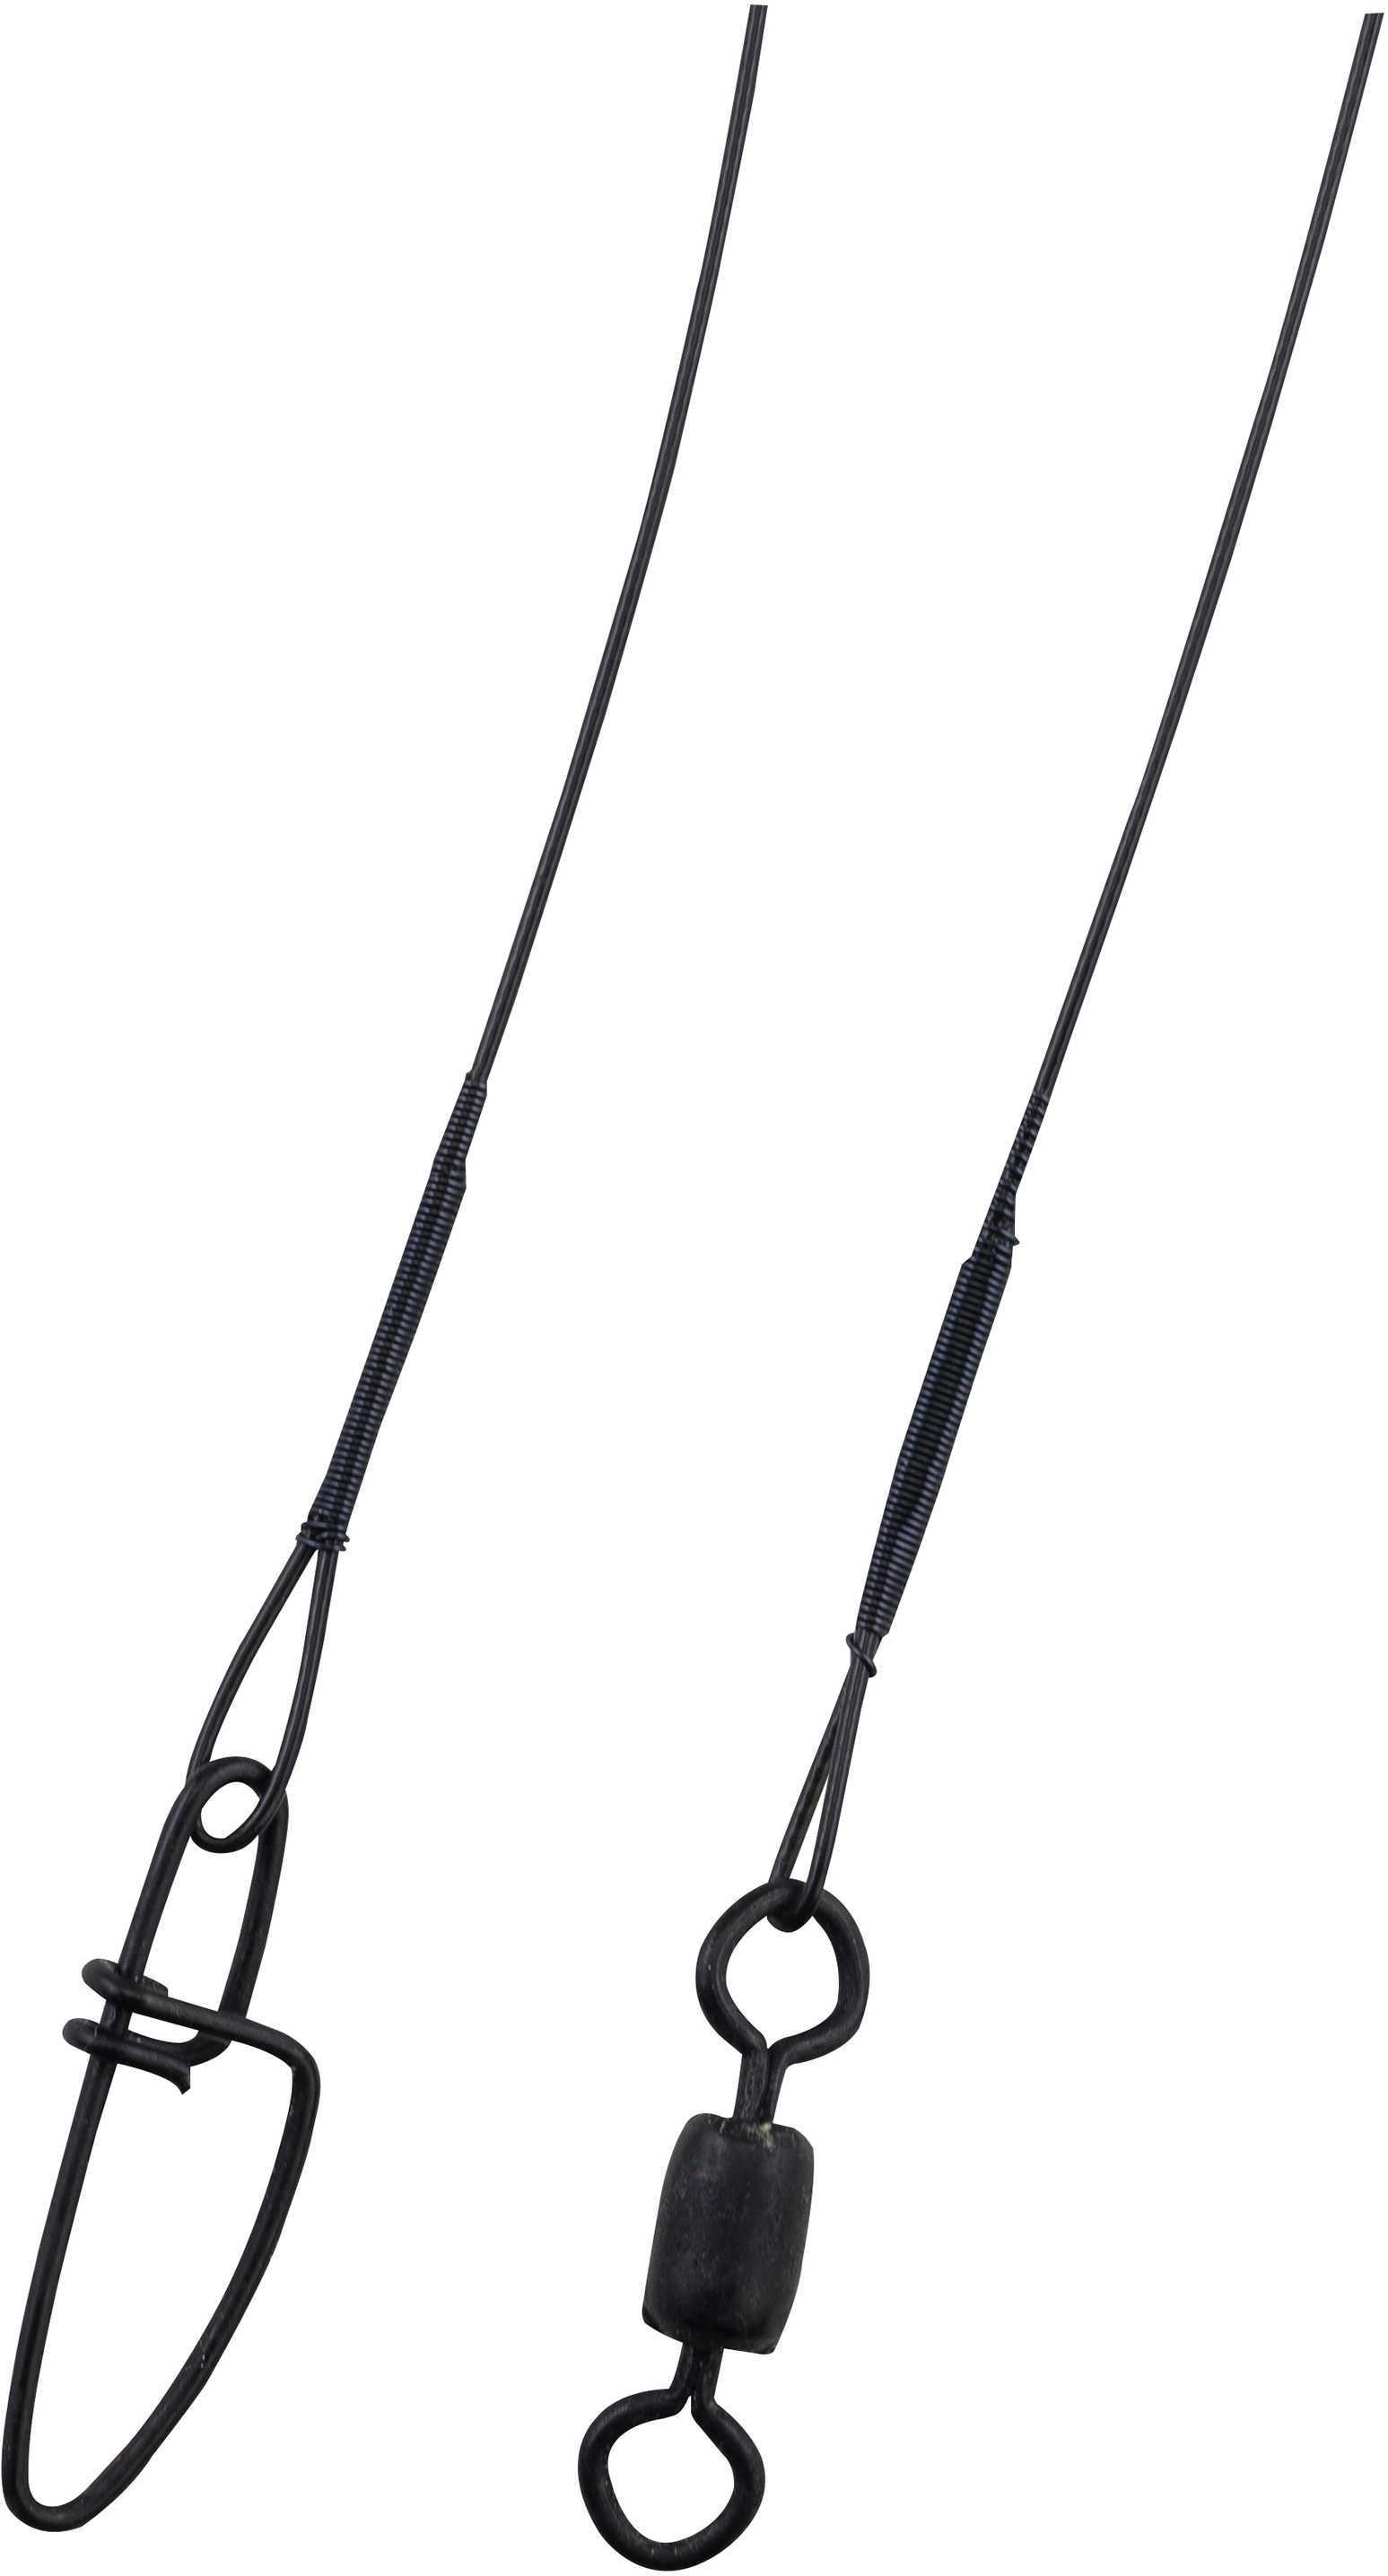 "Berkley Wire-Wound Steelon Leaders 6"" 20 lbs, Black 1011678"